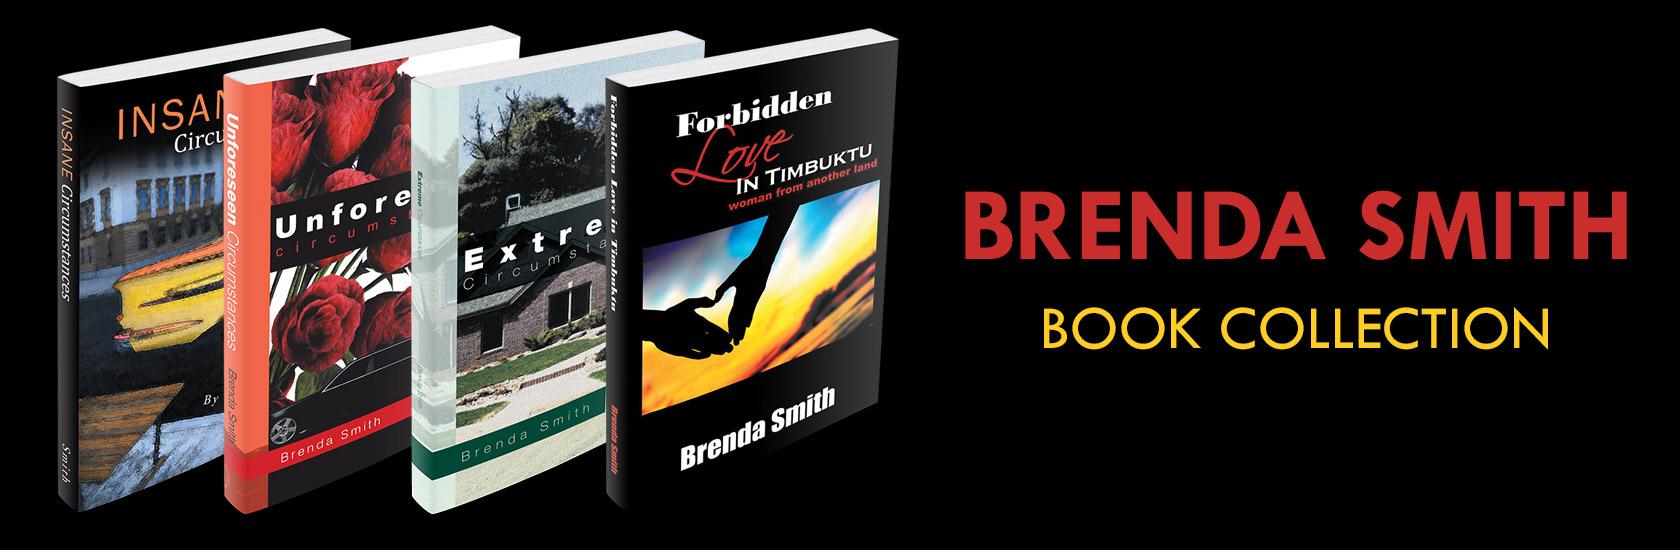 Forbidden Love in Timbuktu